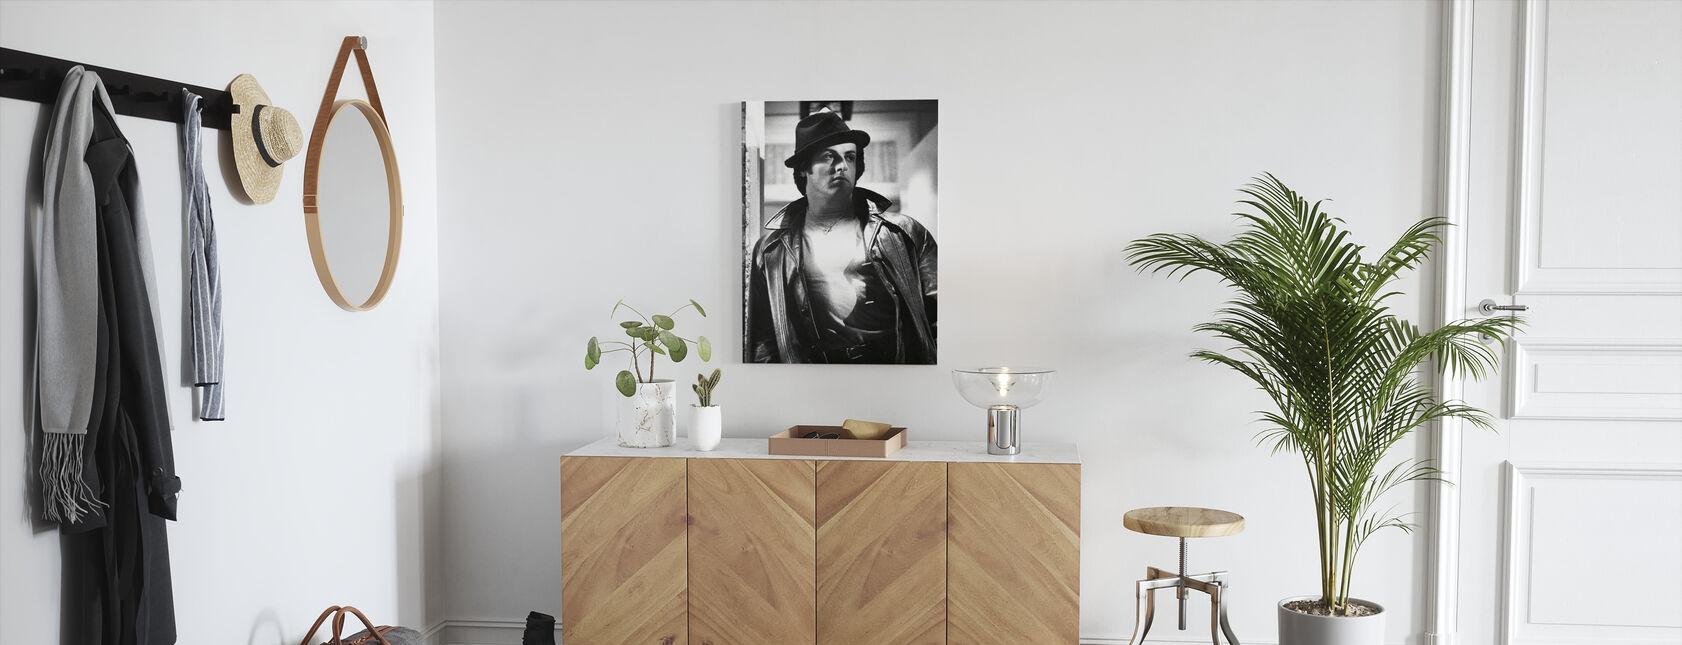 Rocky II - Sylvester Stallone - Canvastaulu - Aula